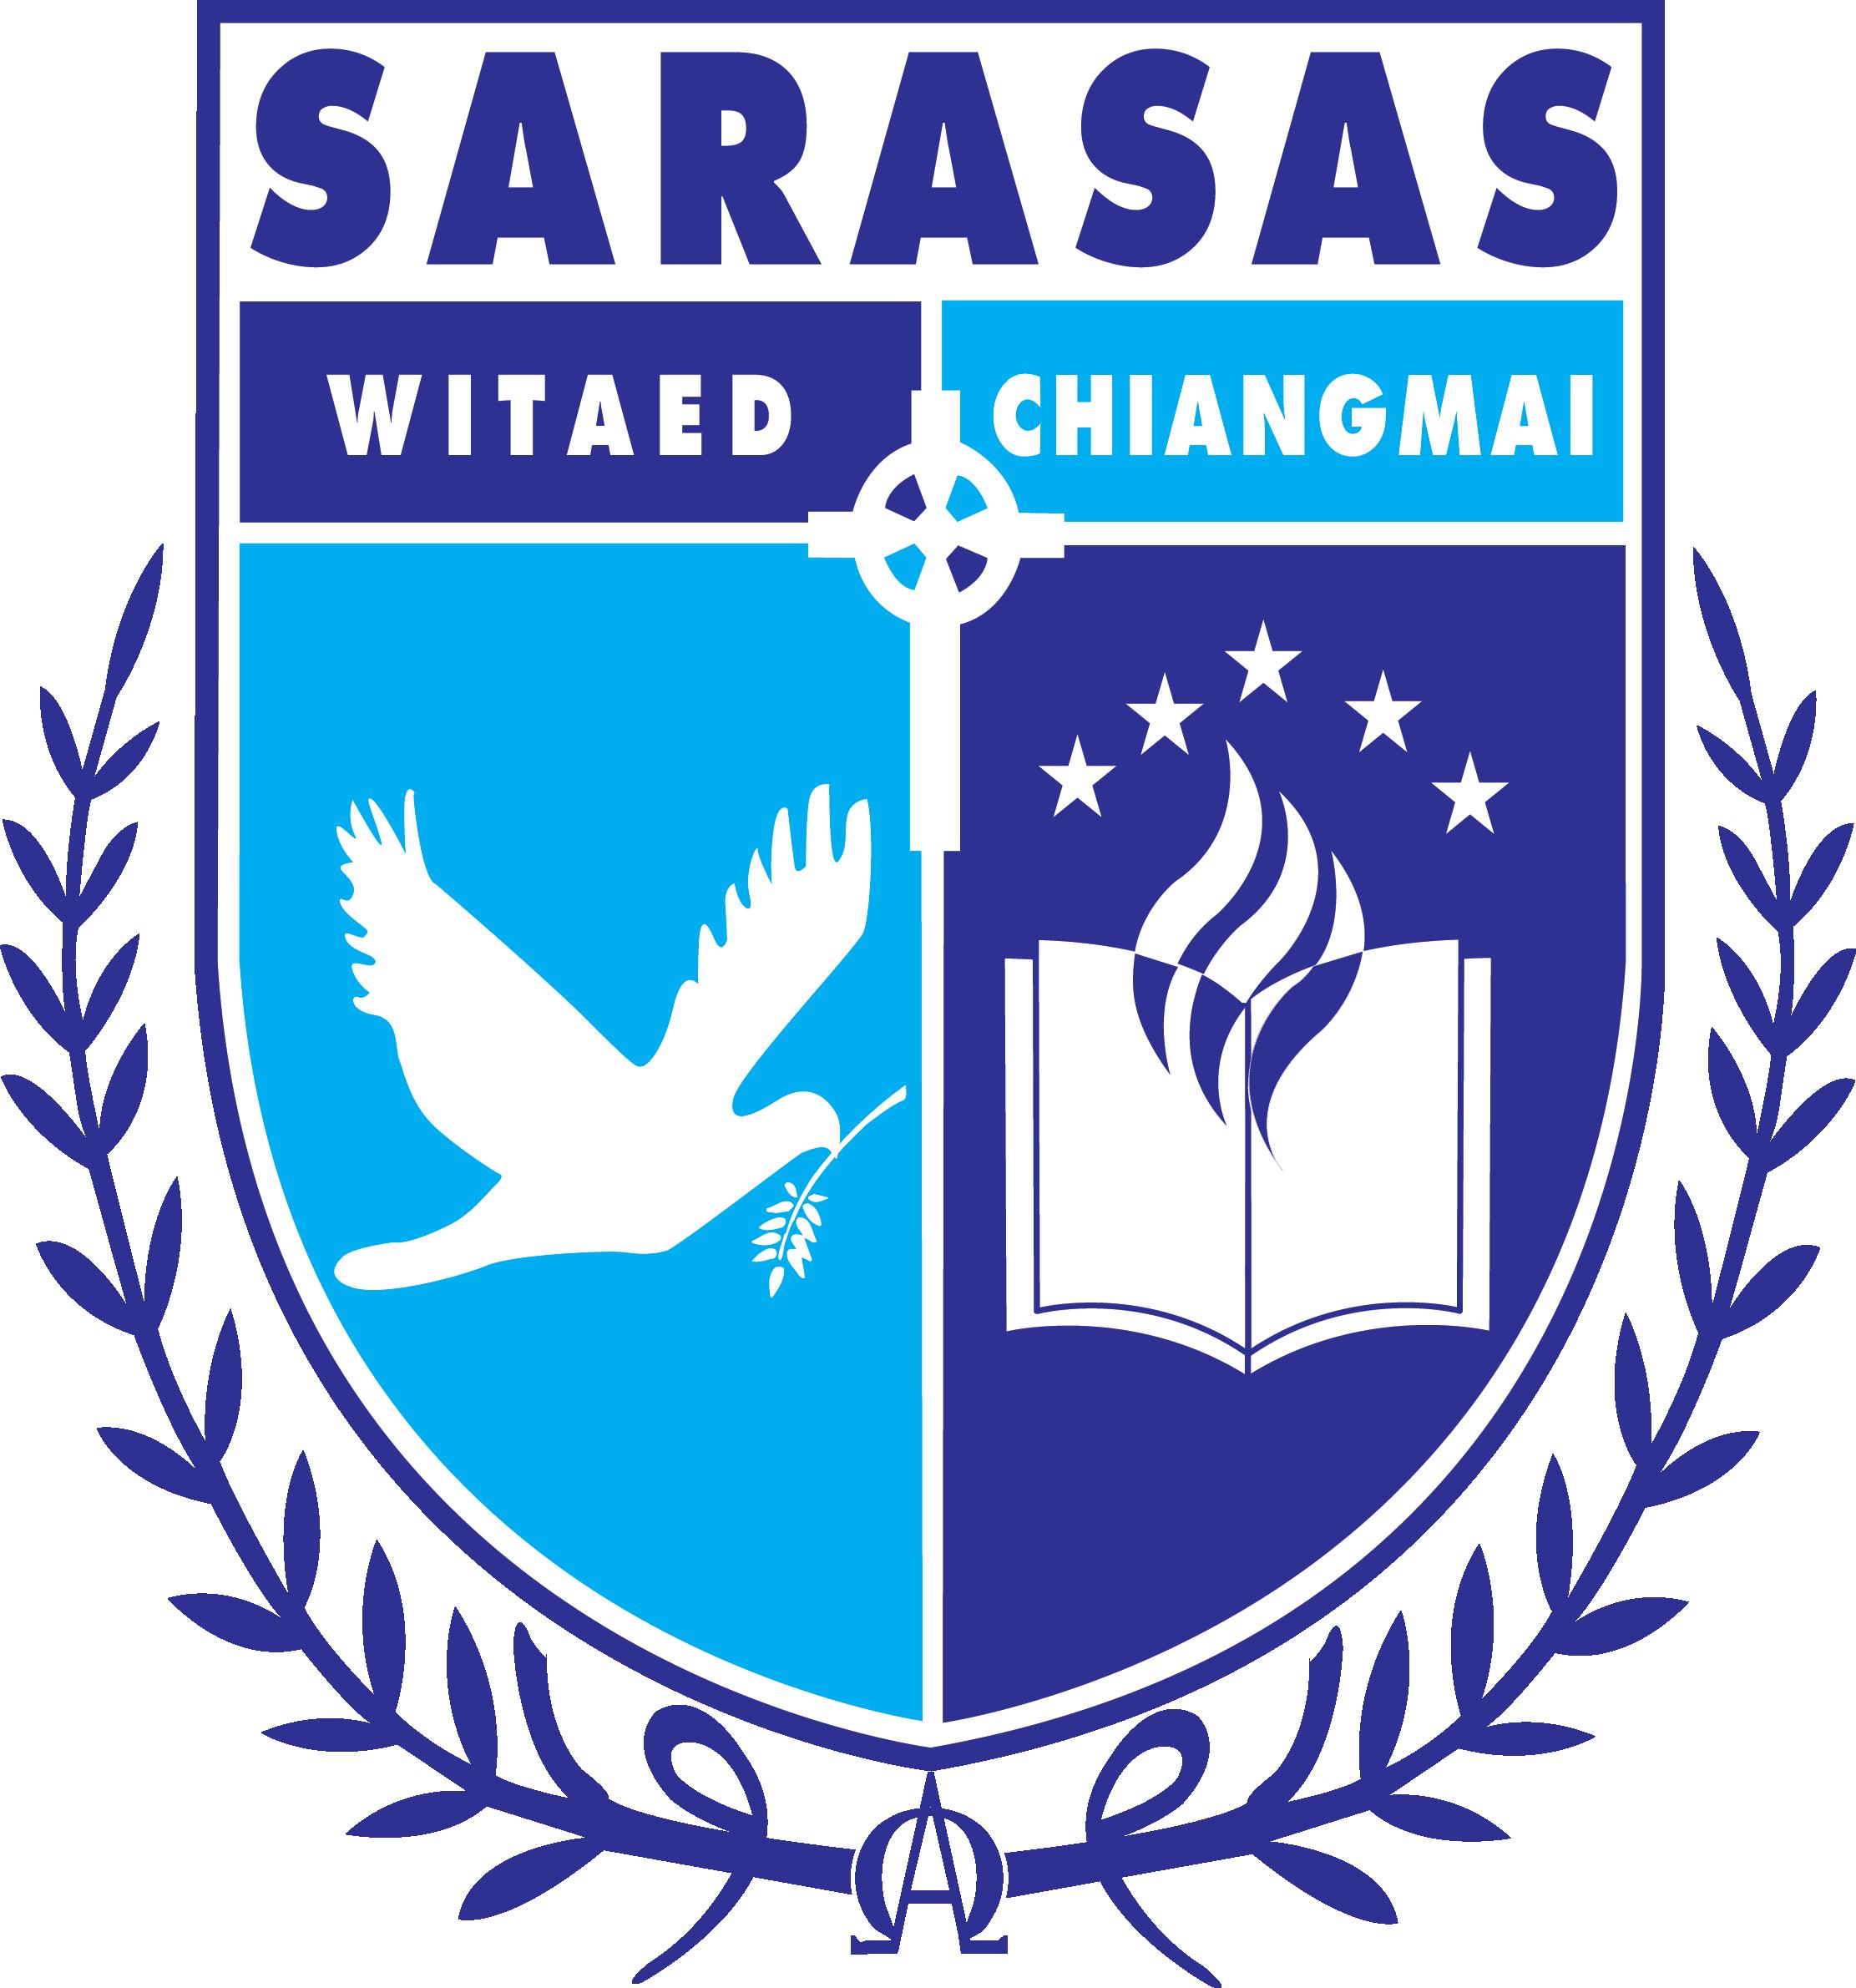 Sarasas  Witaed Chiang Mai  School